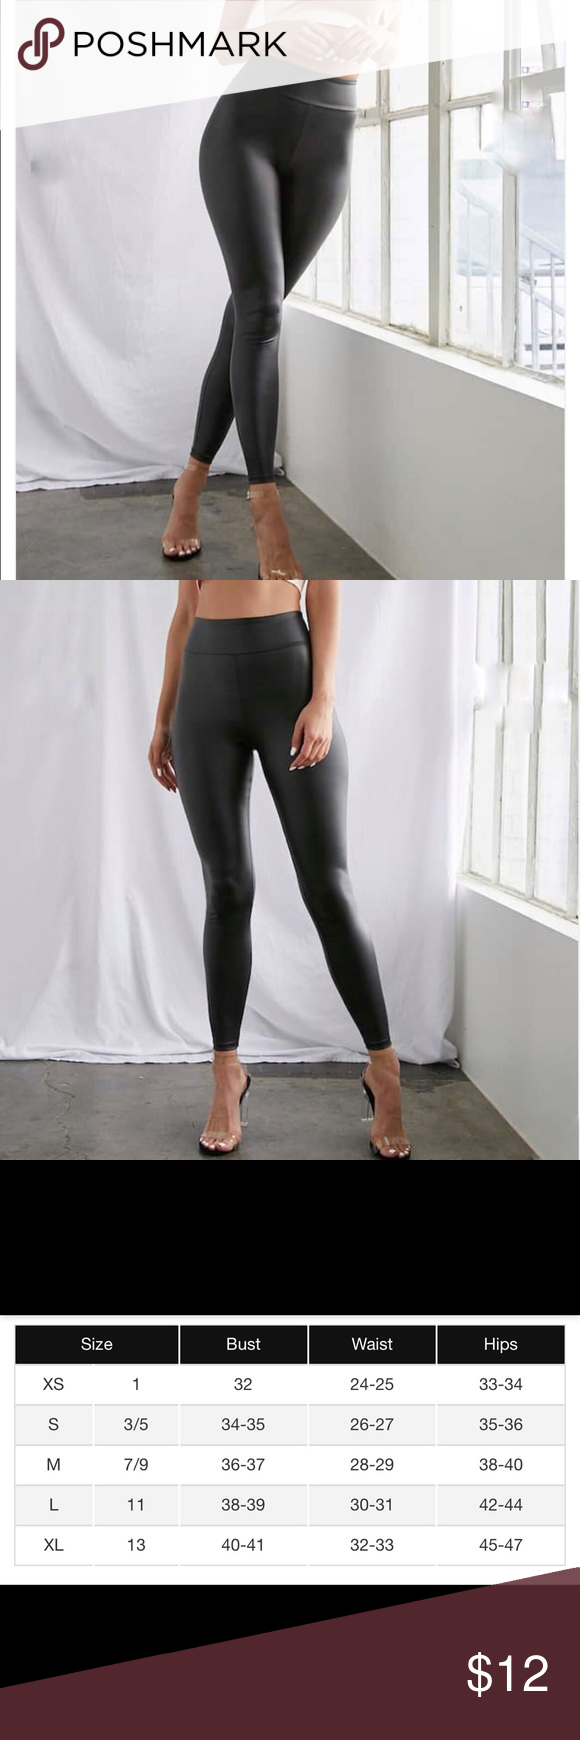 Forever 21 Black Faux Leather Leggings Nwt Faux Leather Leggings Black Faux Leather Leggings Leather Leggings